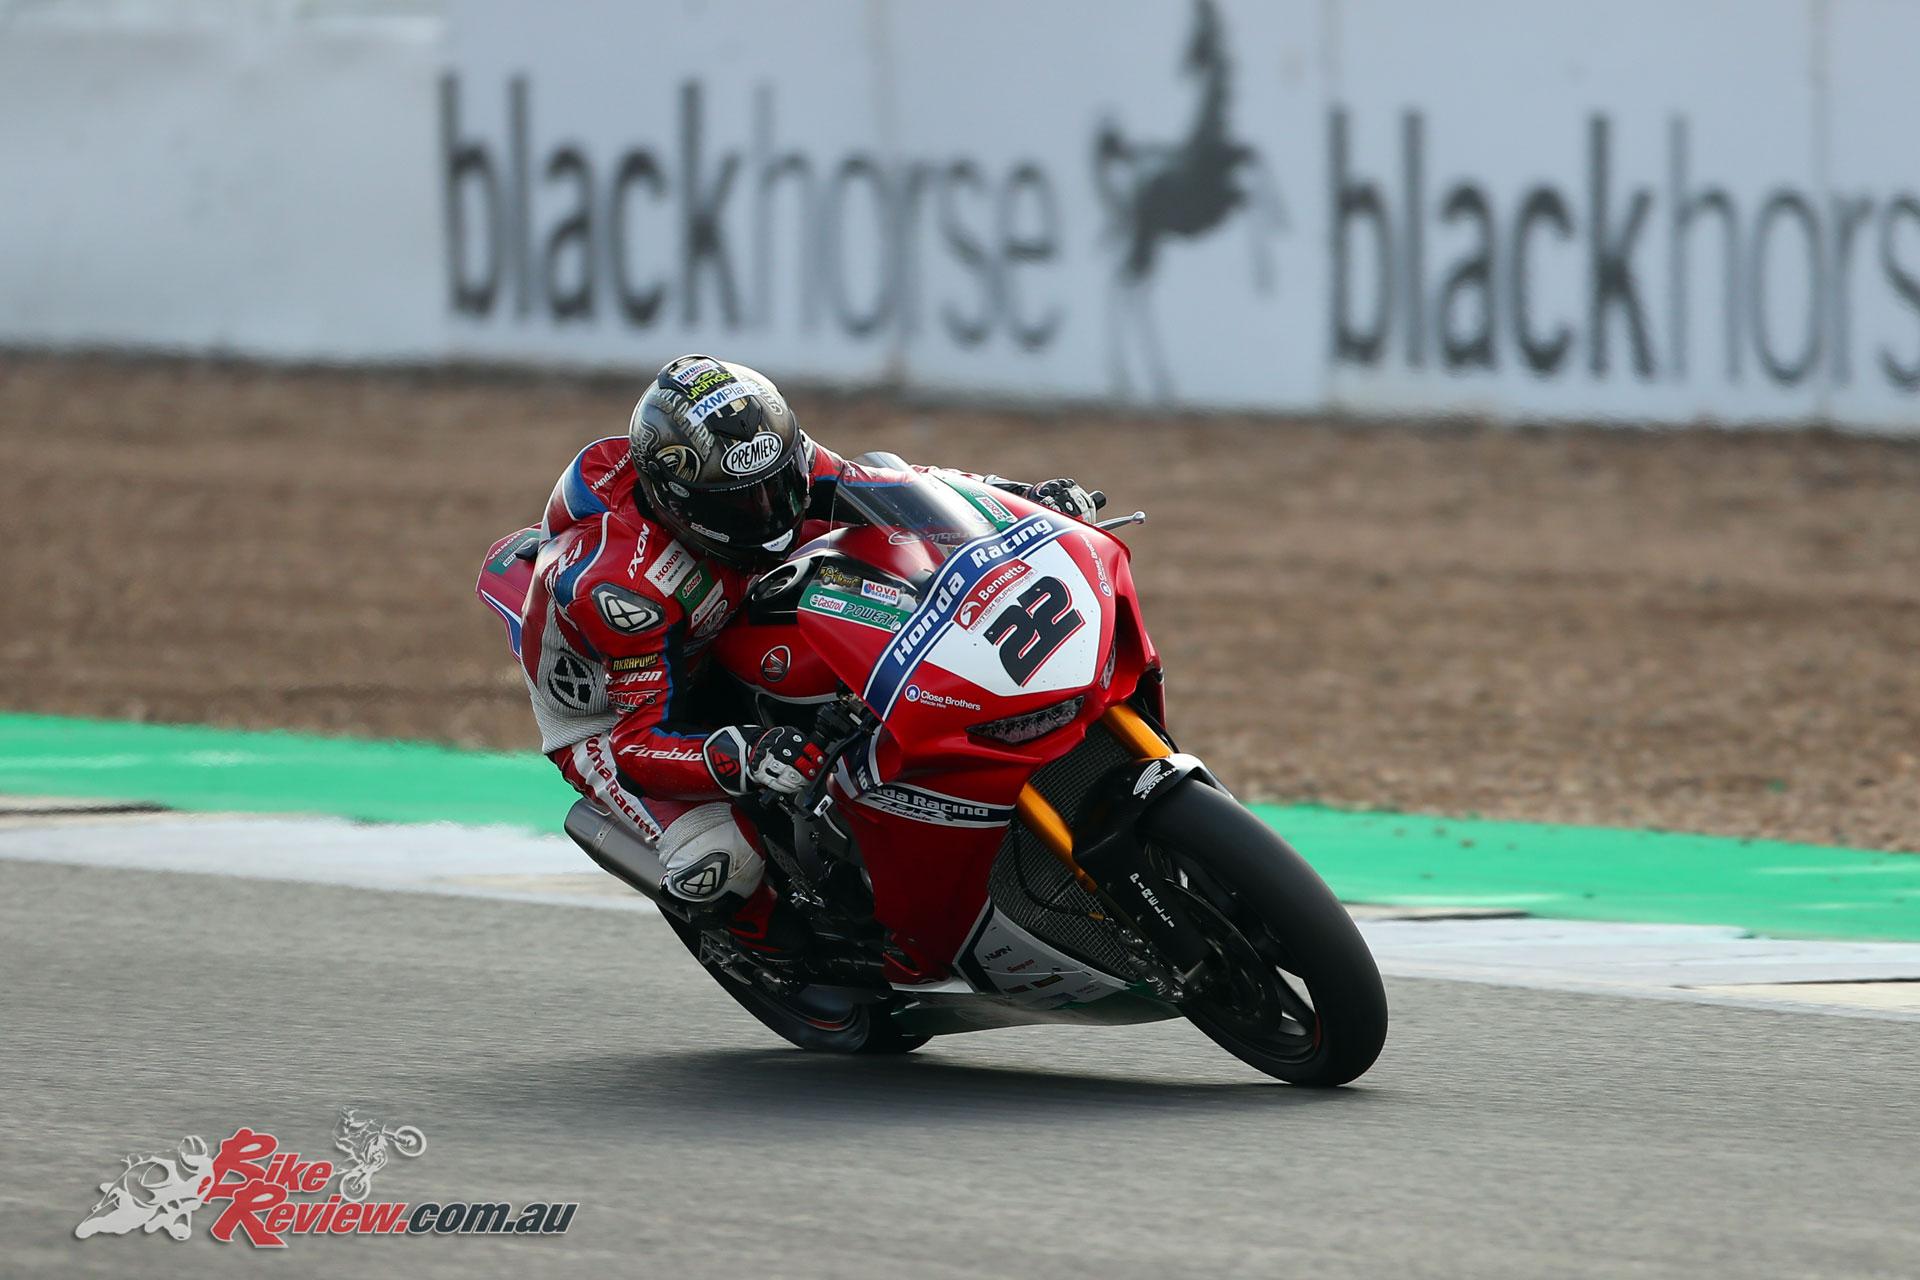 Jason O'Halloran - BSB 2018 Silverstone